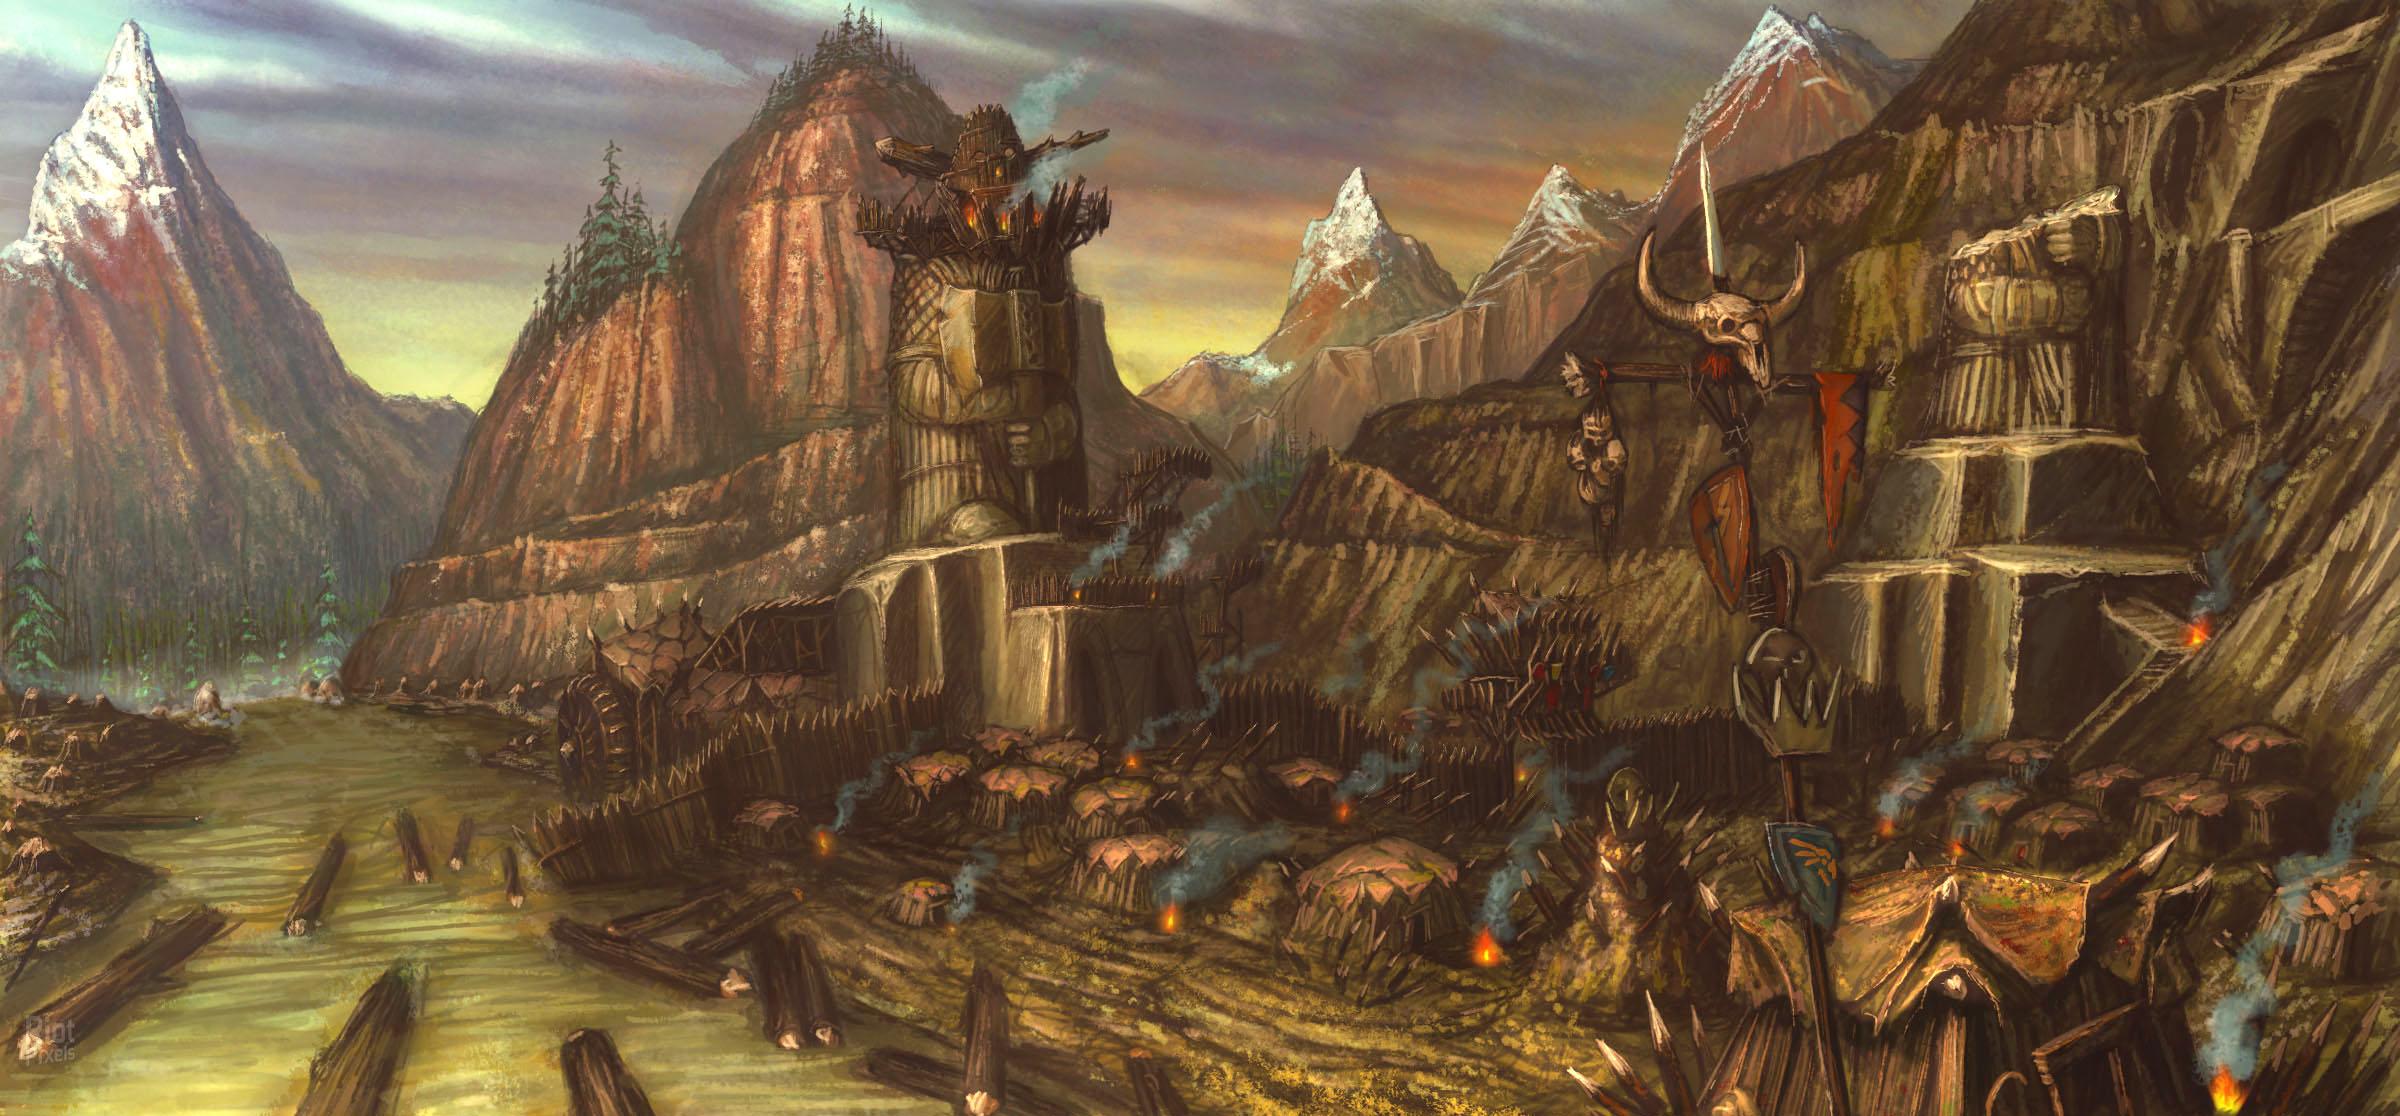 http://s01.riotpixels.net/data/2f/34/2f341af7-2d1f-42e0-9588-a6a9aace7dcc.jpg/artwork.warhammer-online-age-of-reckoning.2400x1116.2006-03-15.60.jpg